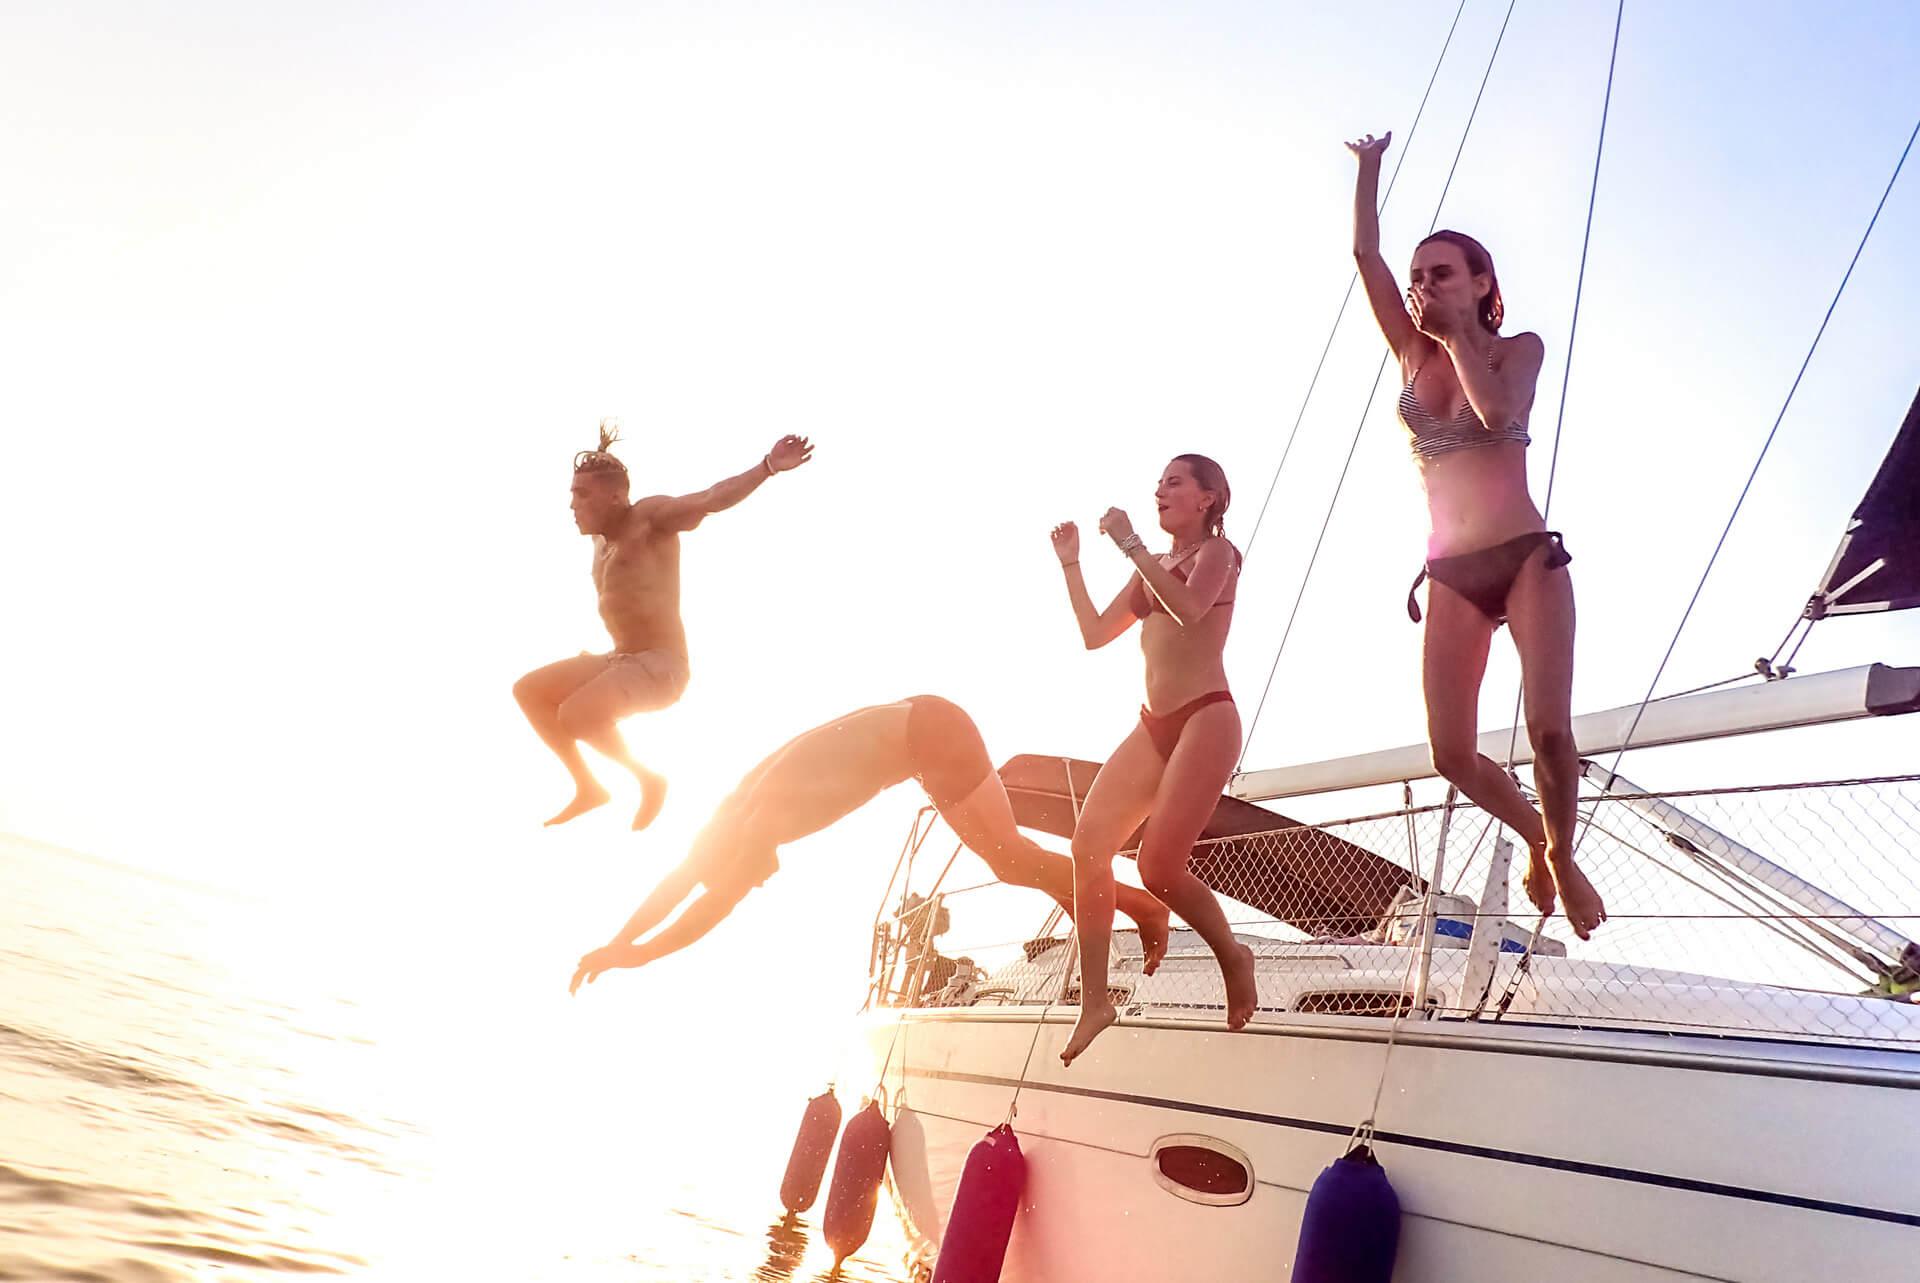 Elite Crete - Luxury Tourism in Chania, Crete - Concierge Services - Crusies